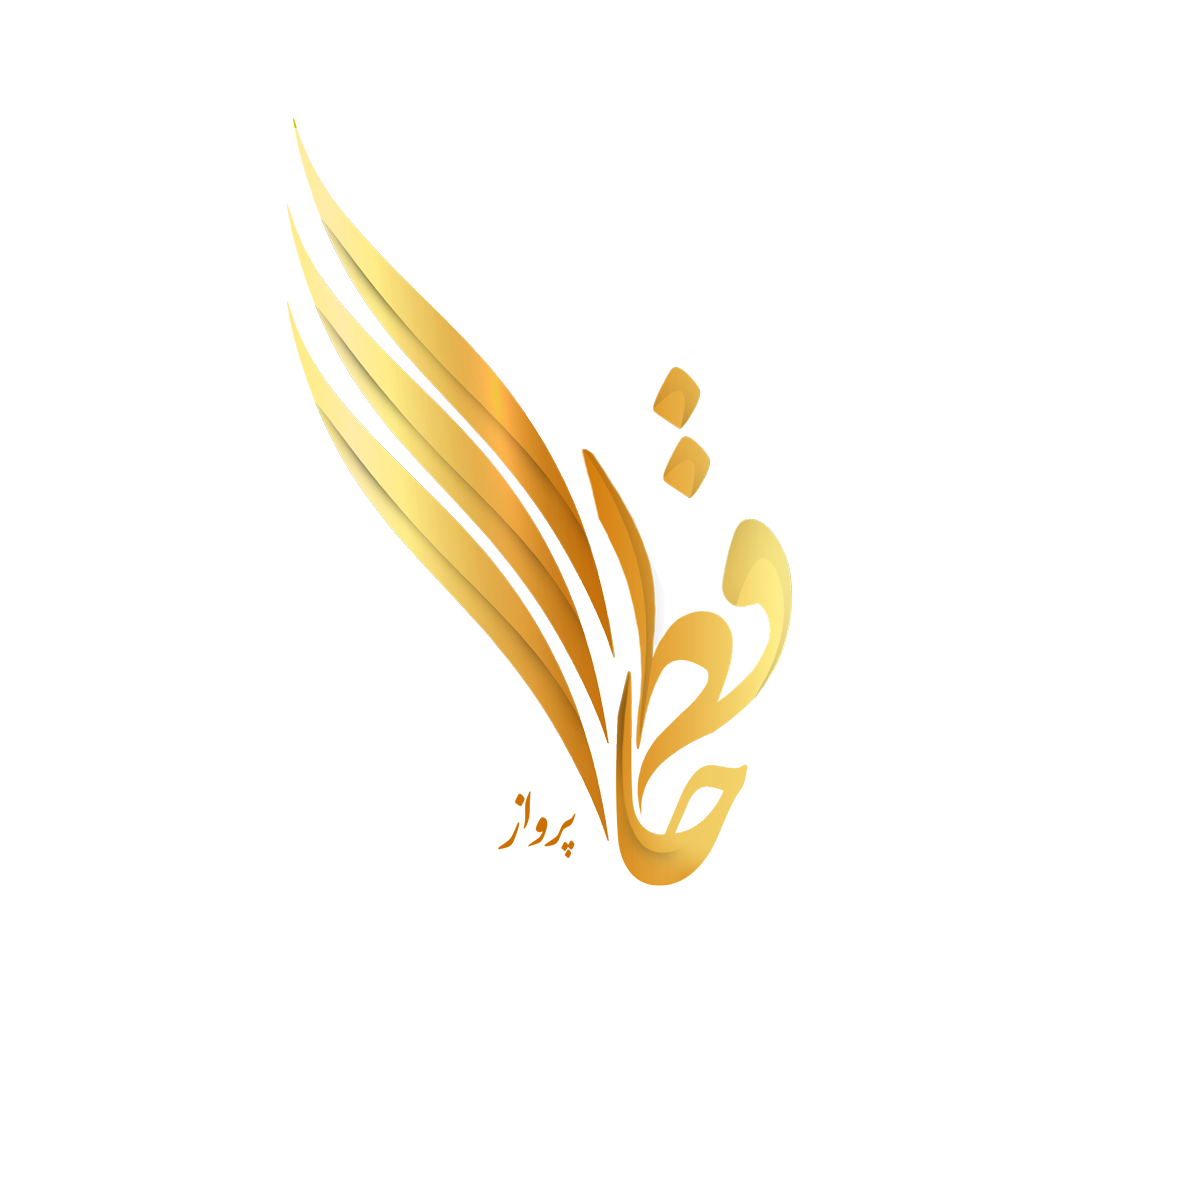 لوگوی پاورقی